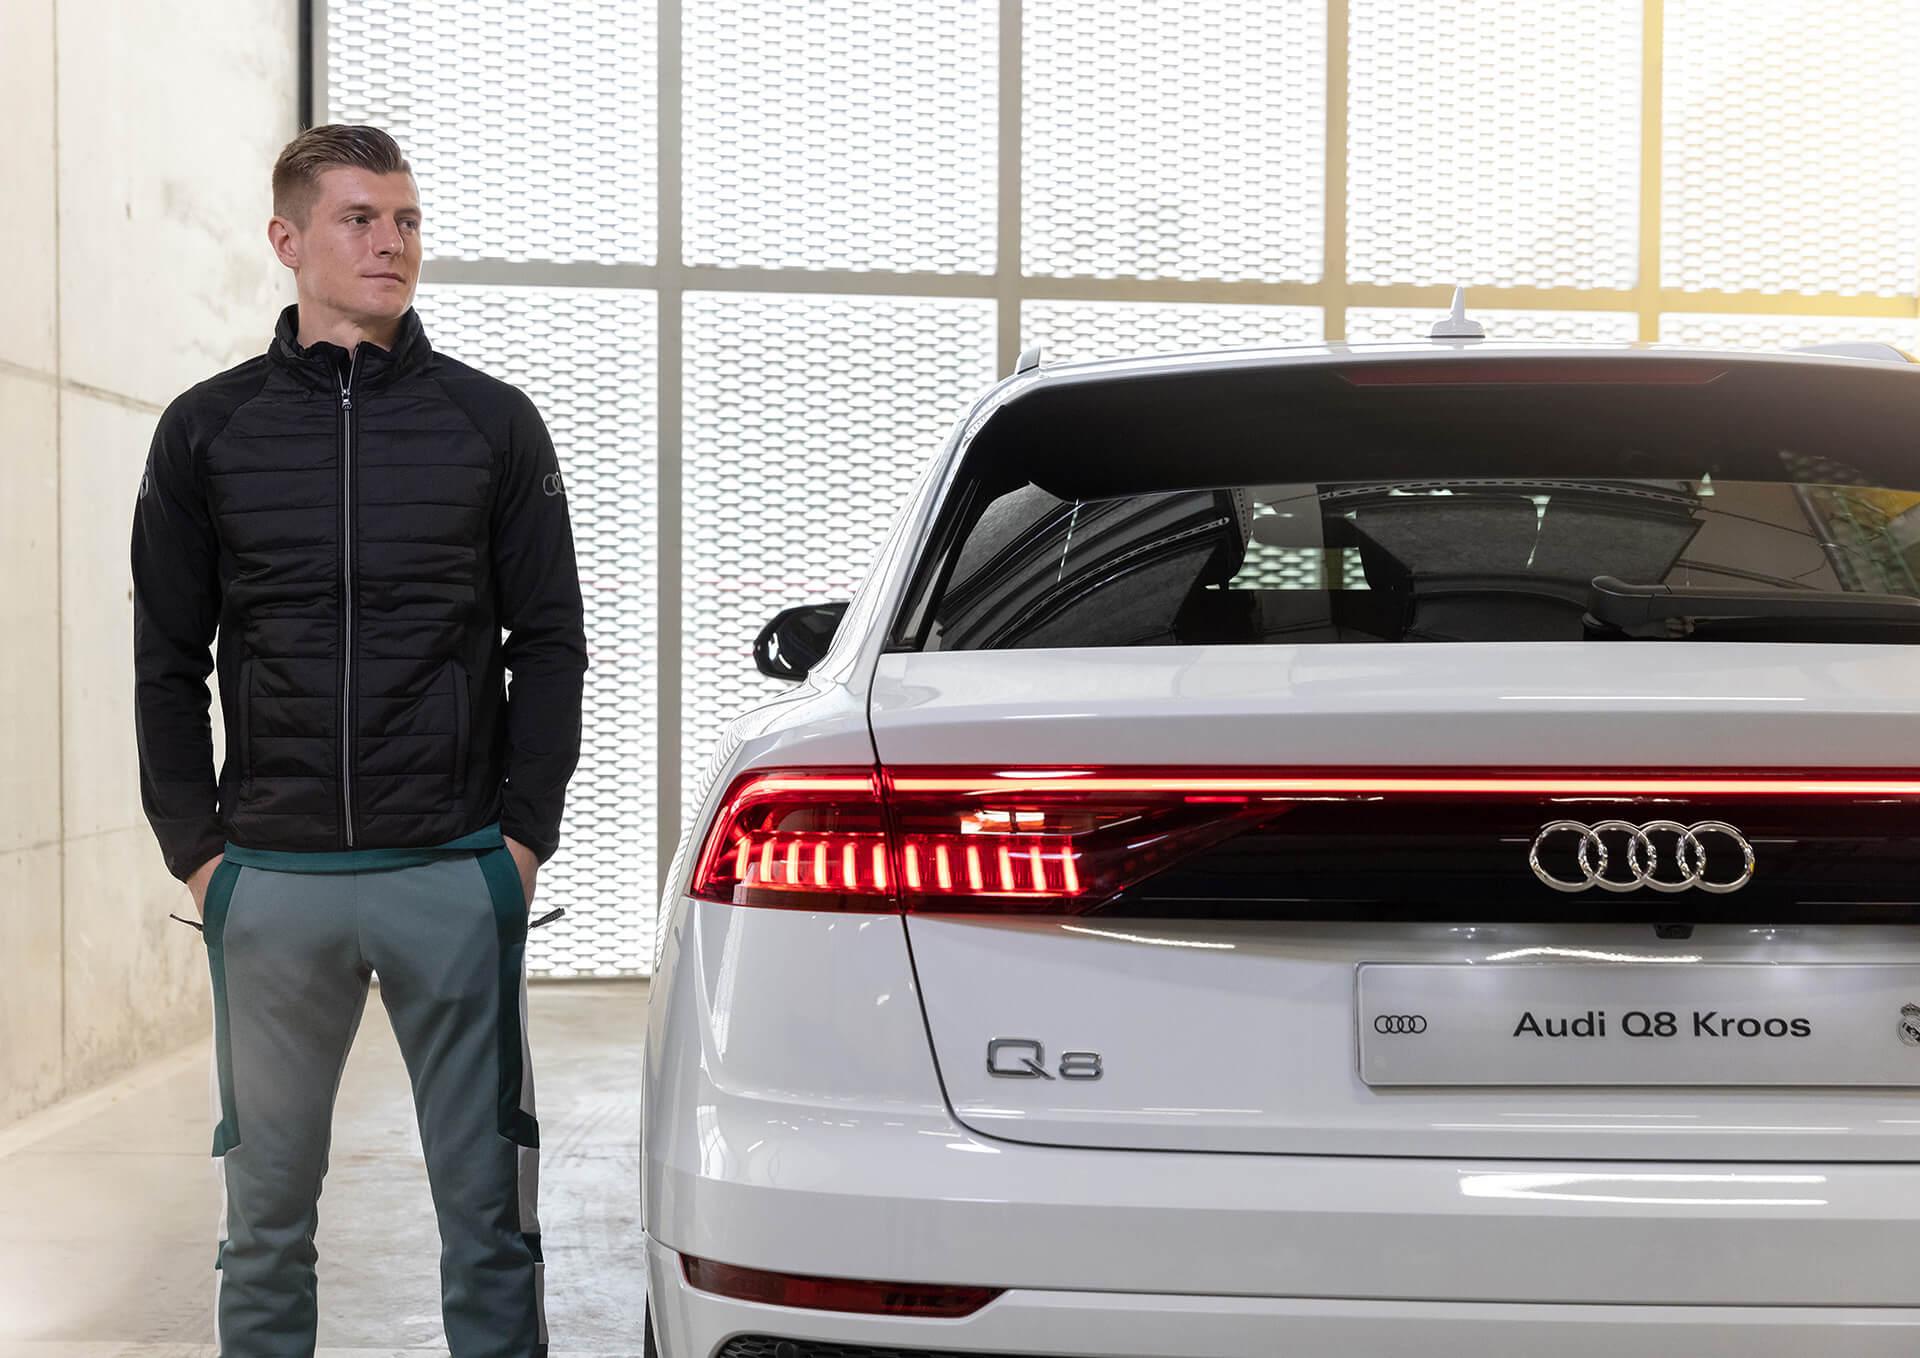 AUDI & REAL MADRID - Toni Kroos - Audi Q8 50 TDI quattro